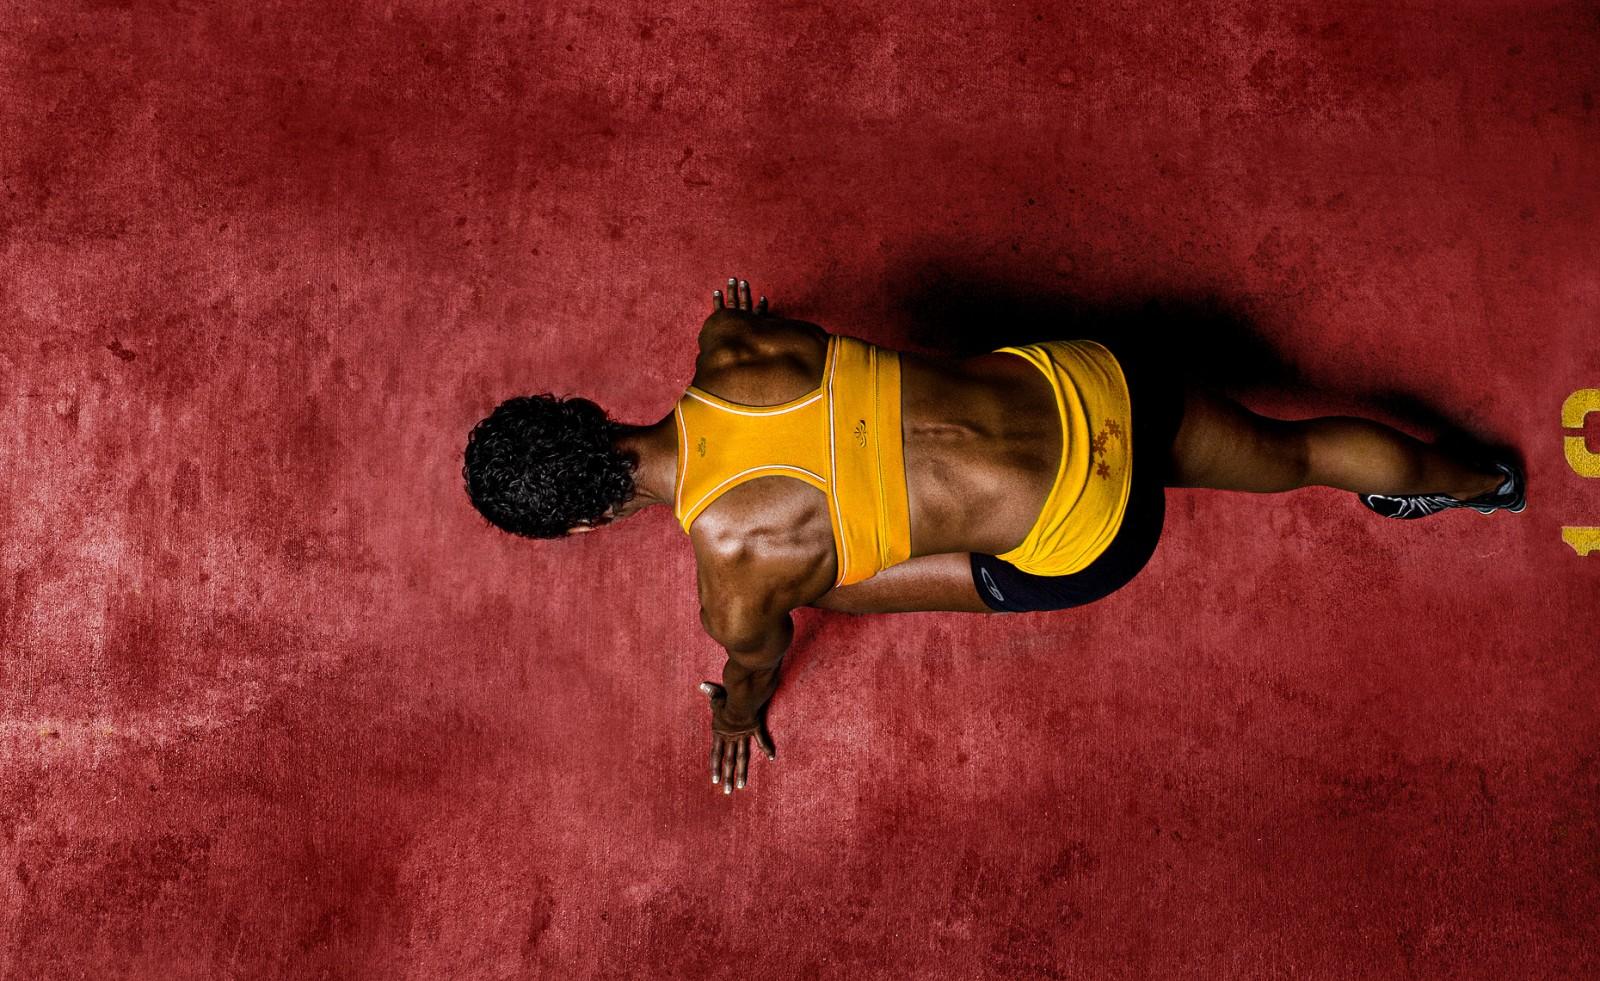 Hristo-Shindov-Photography-sports